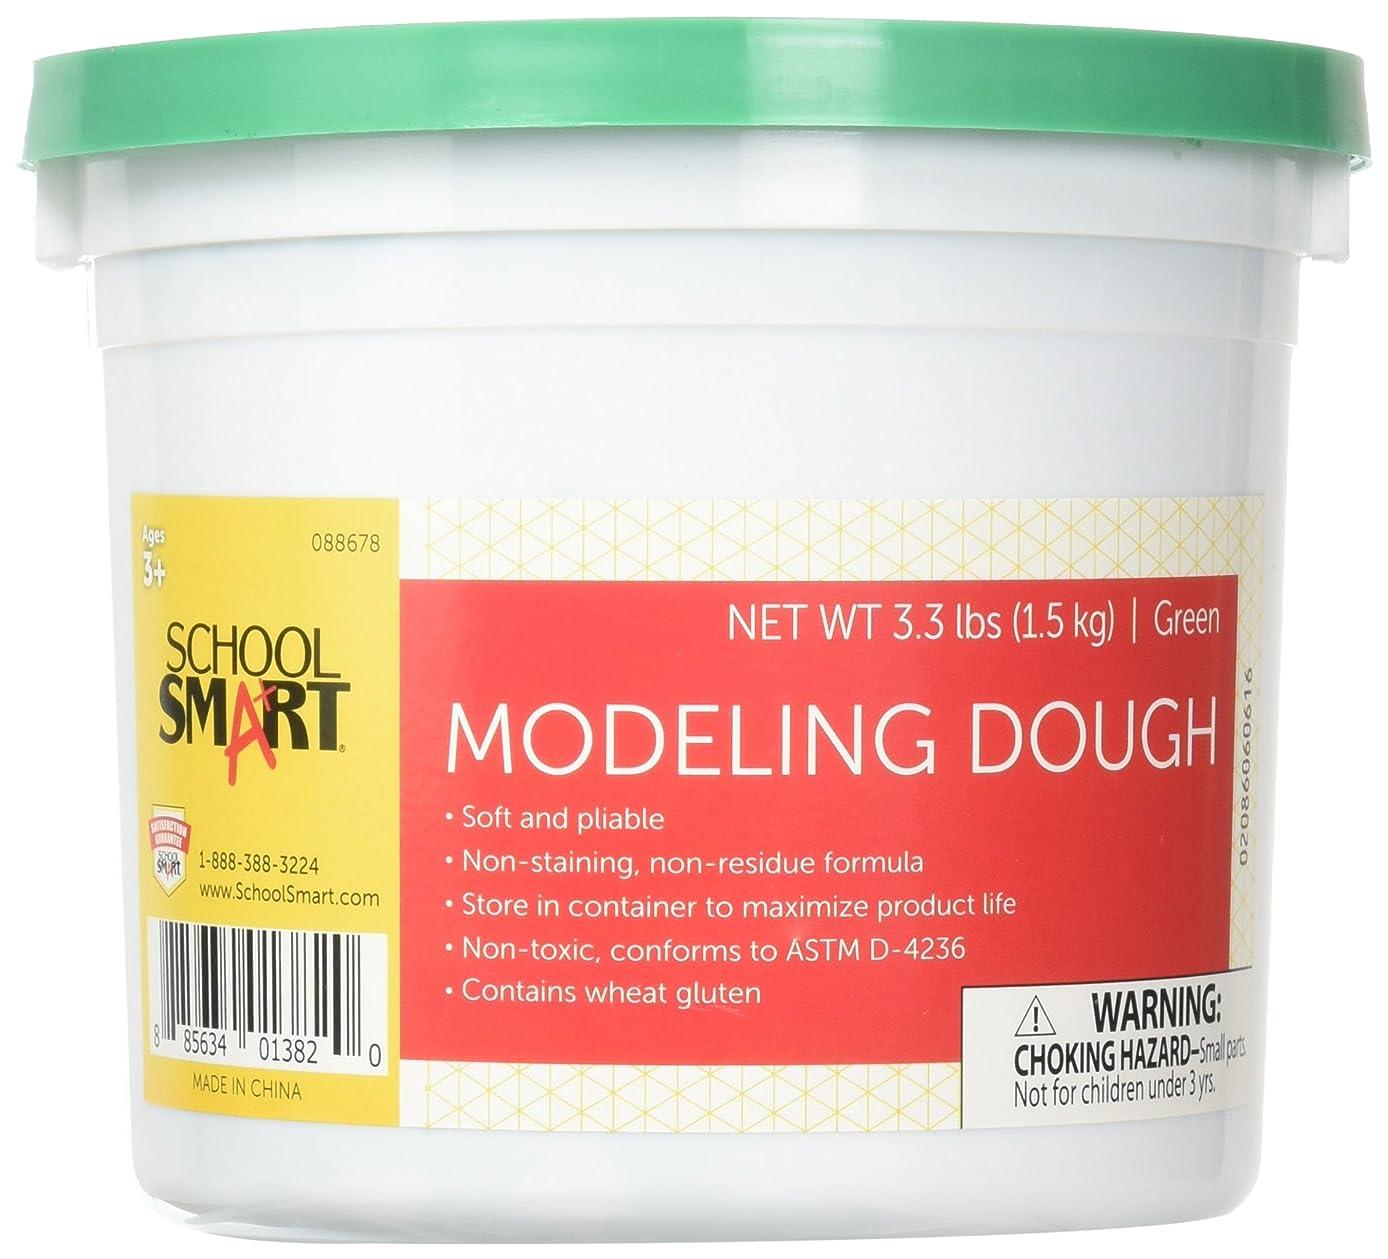 School Smart 88678 Non Toxic Modeling Dough - 3 1/3 pounds - Green